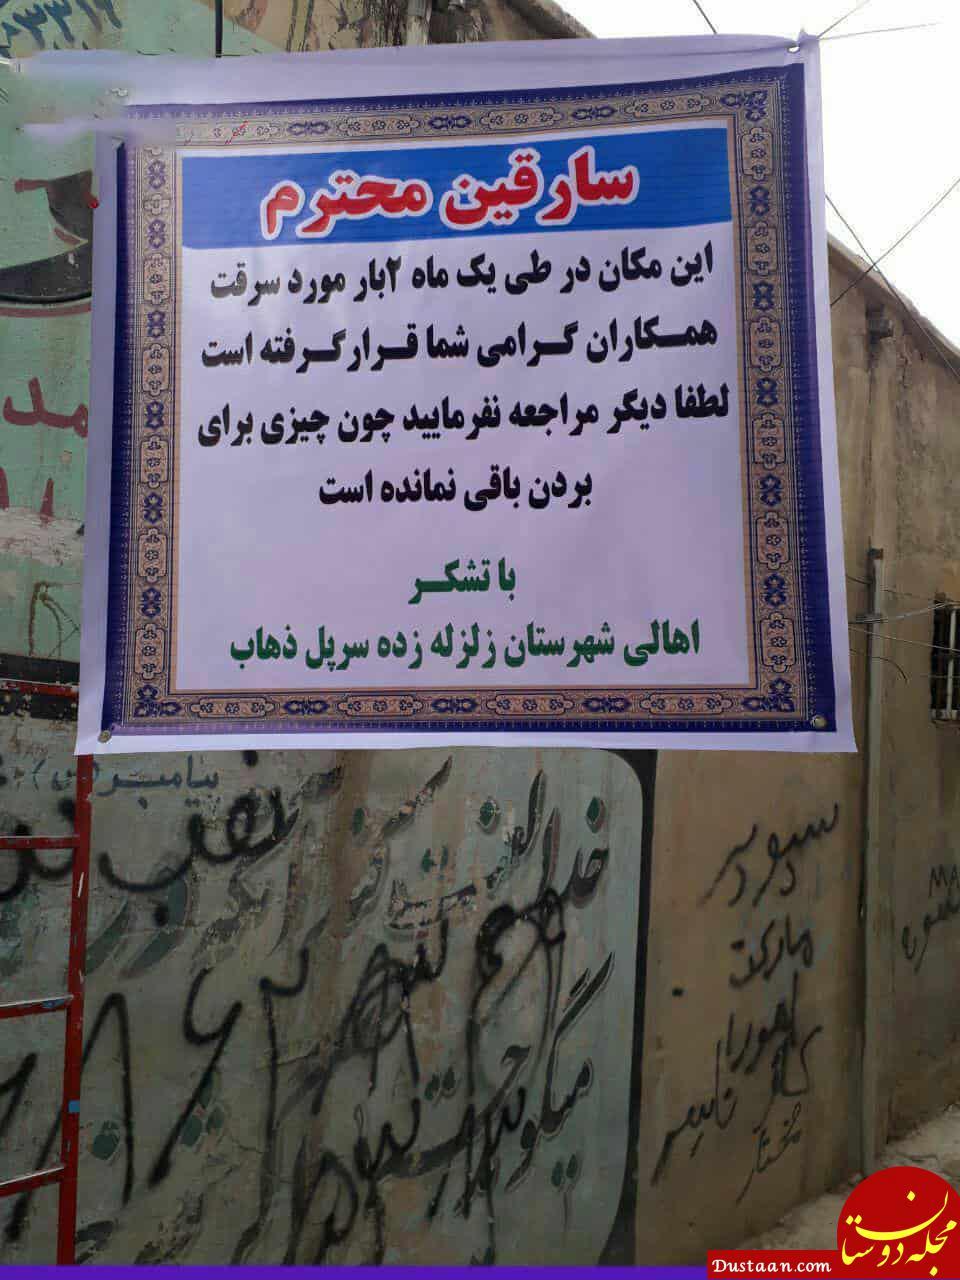 www.dustaan.com ابتکار جالب شهروندان زلزله زده سرپل ذهابی برای سارقان! +عکس